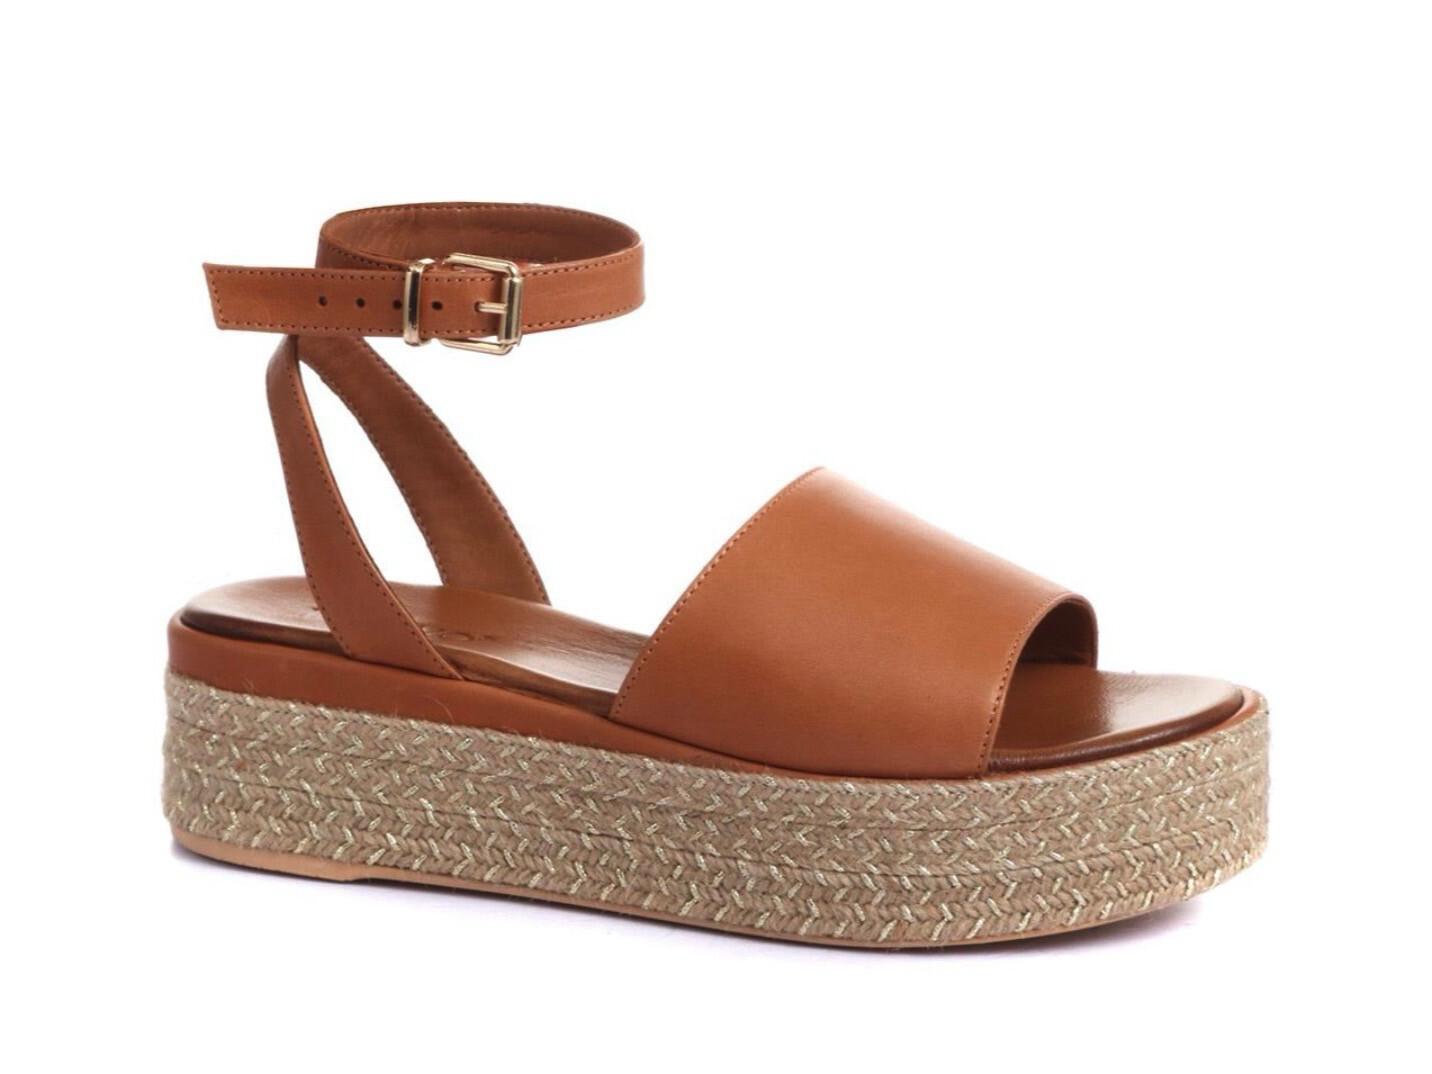 Tan Leather Flatform Sandal